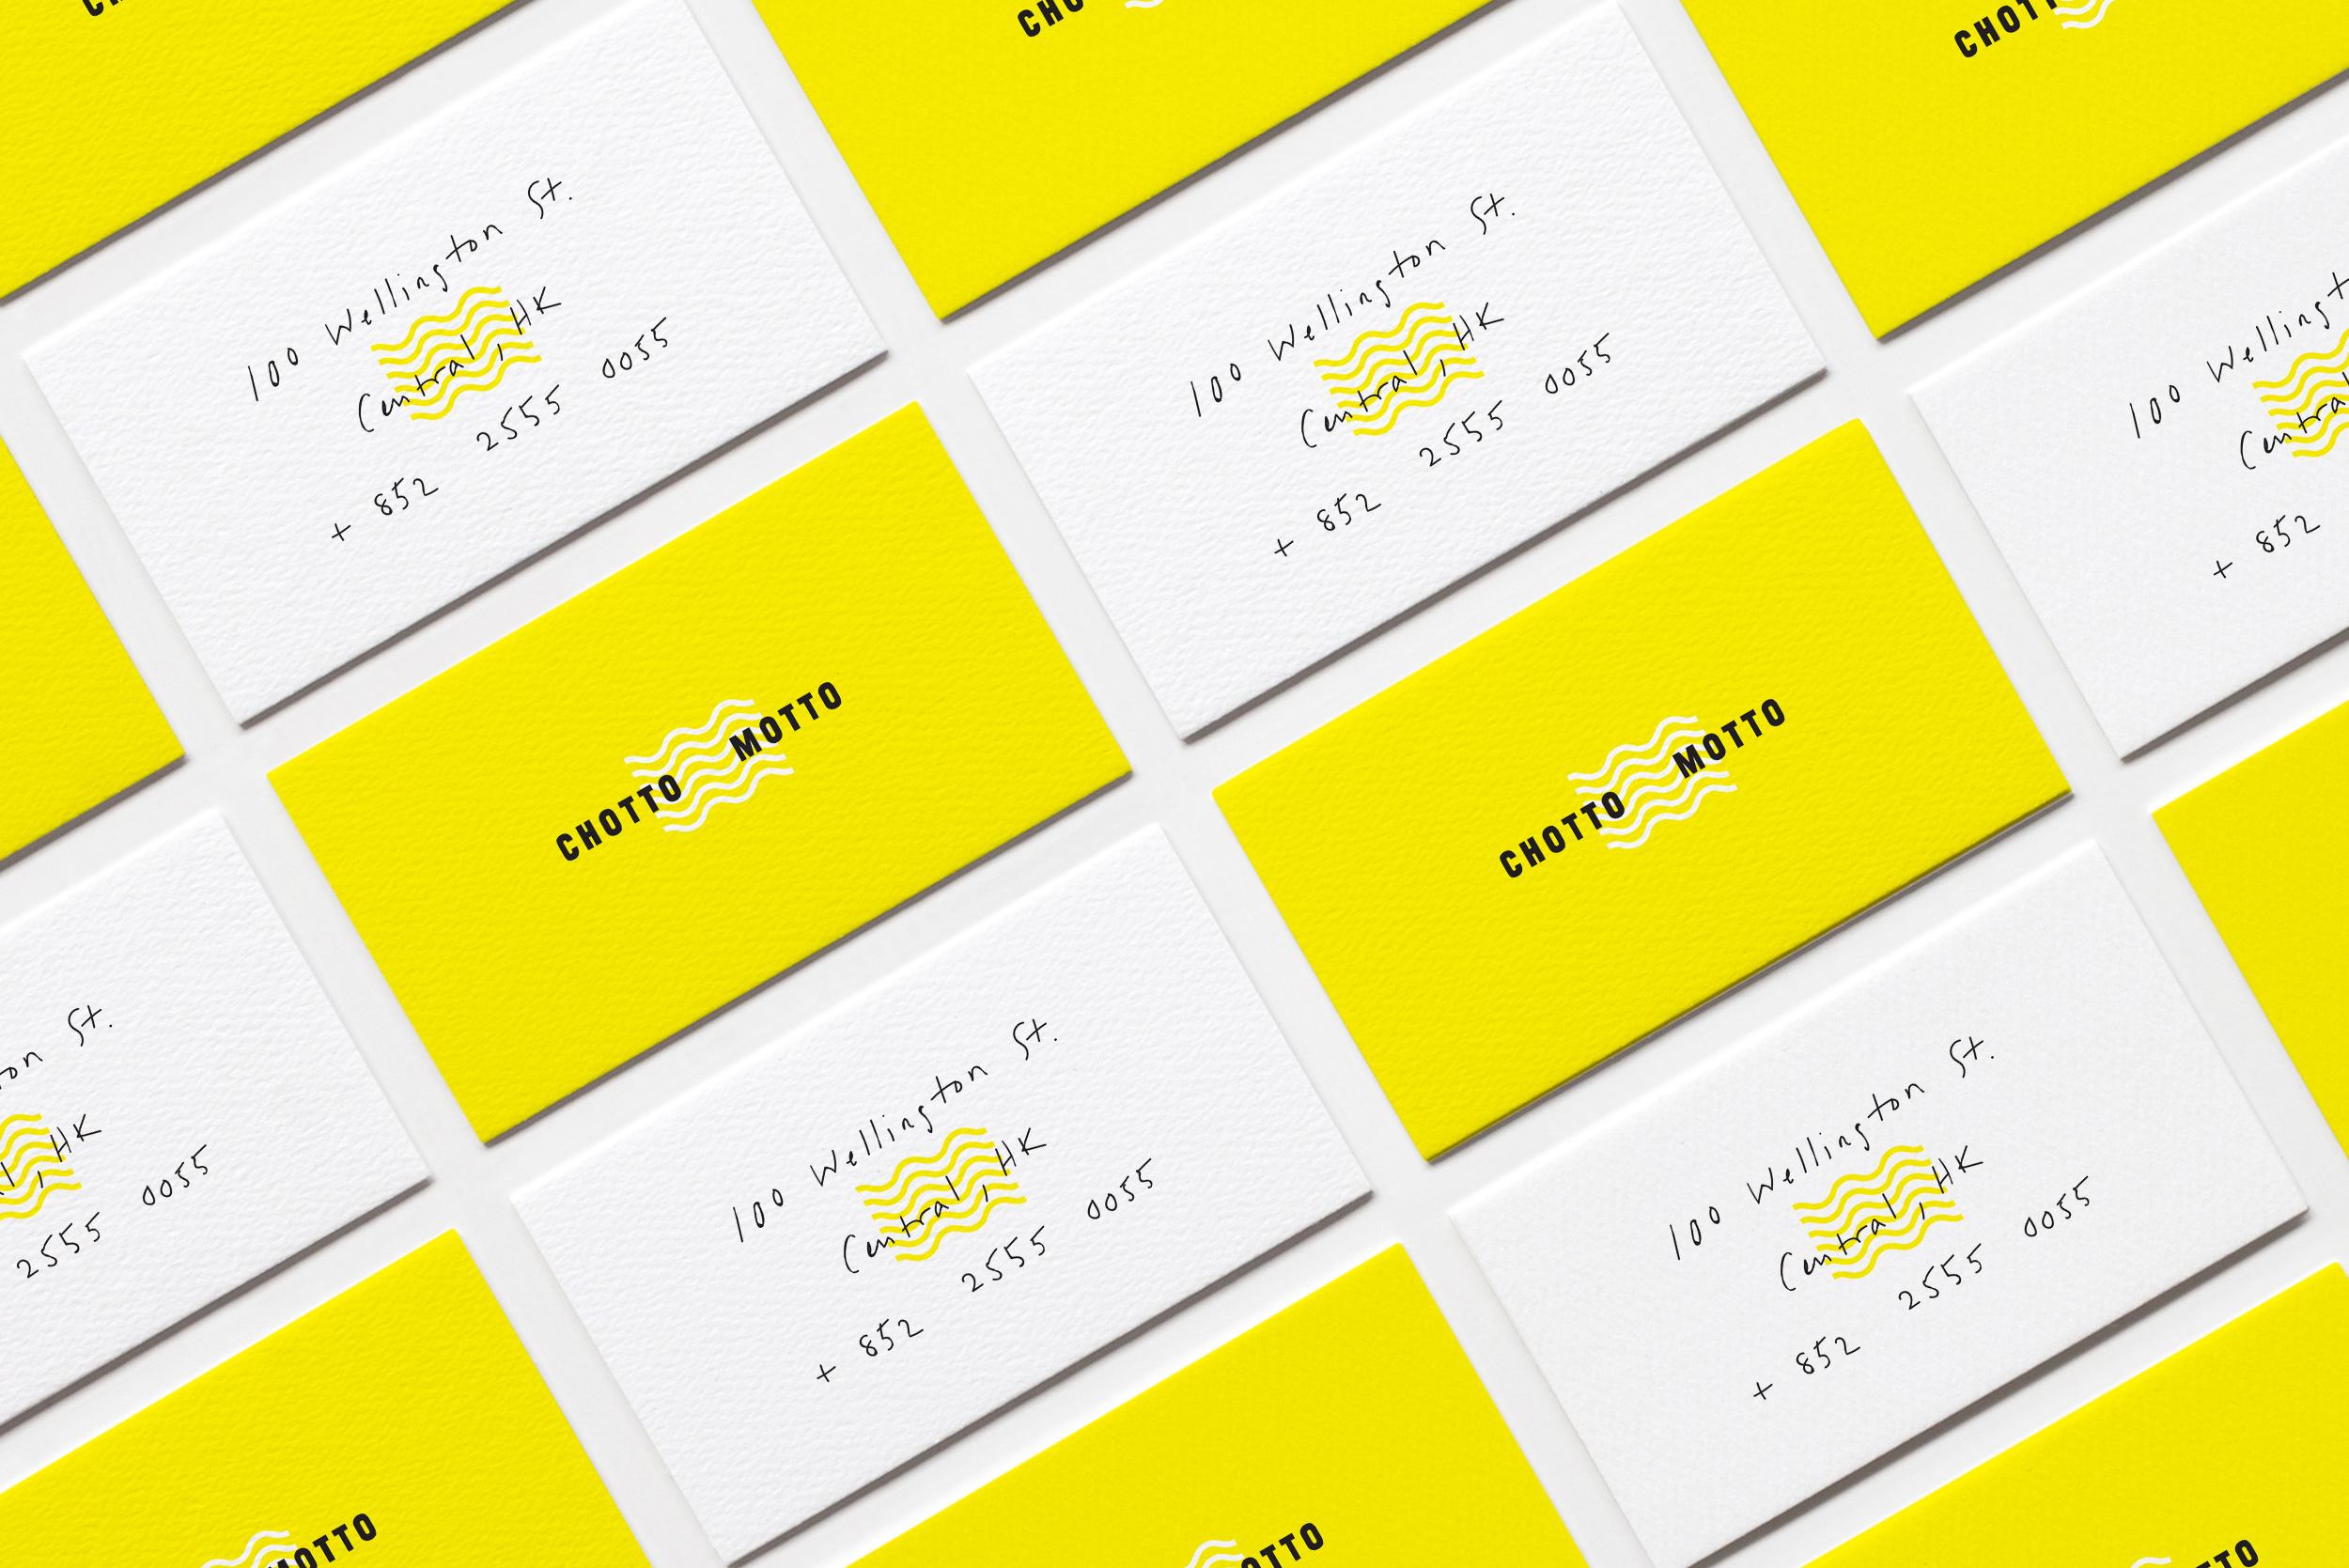 chotto-motto-cards.jpg